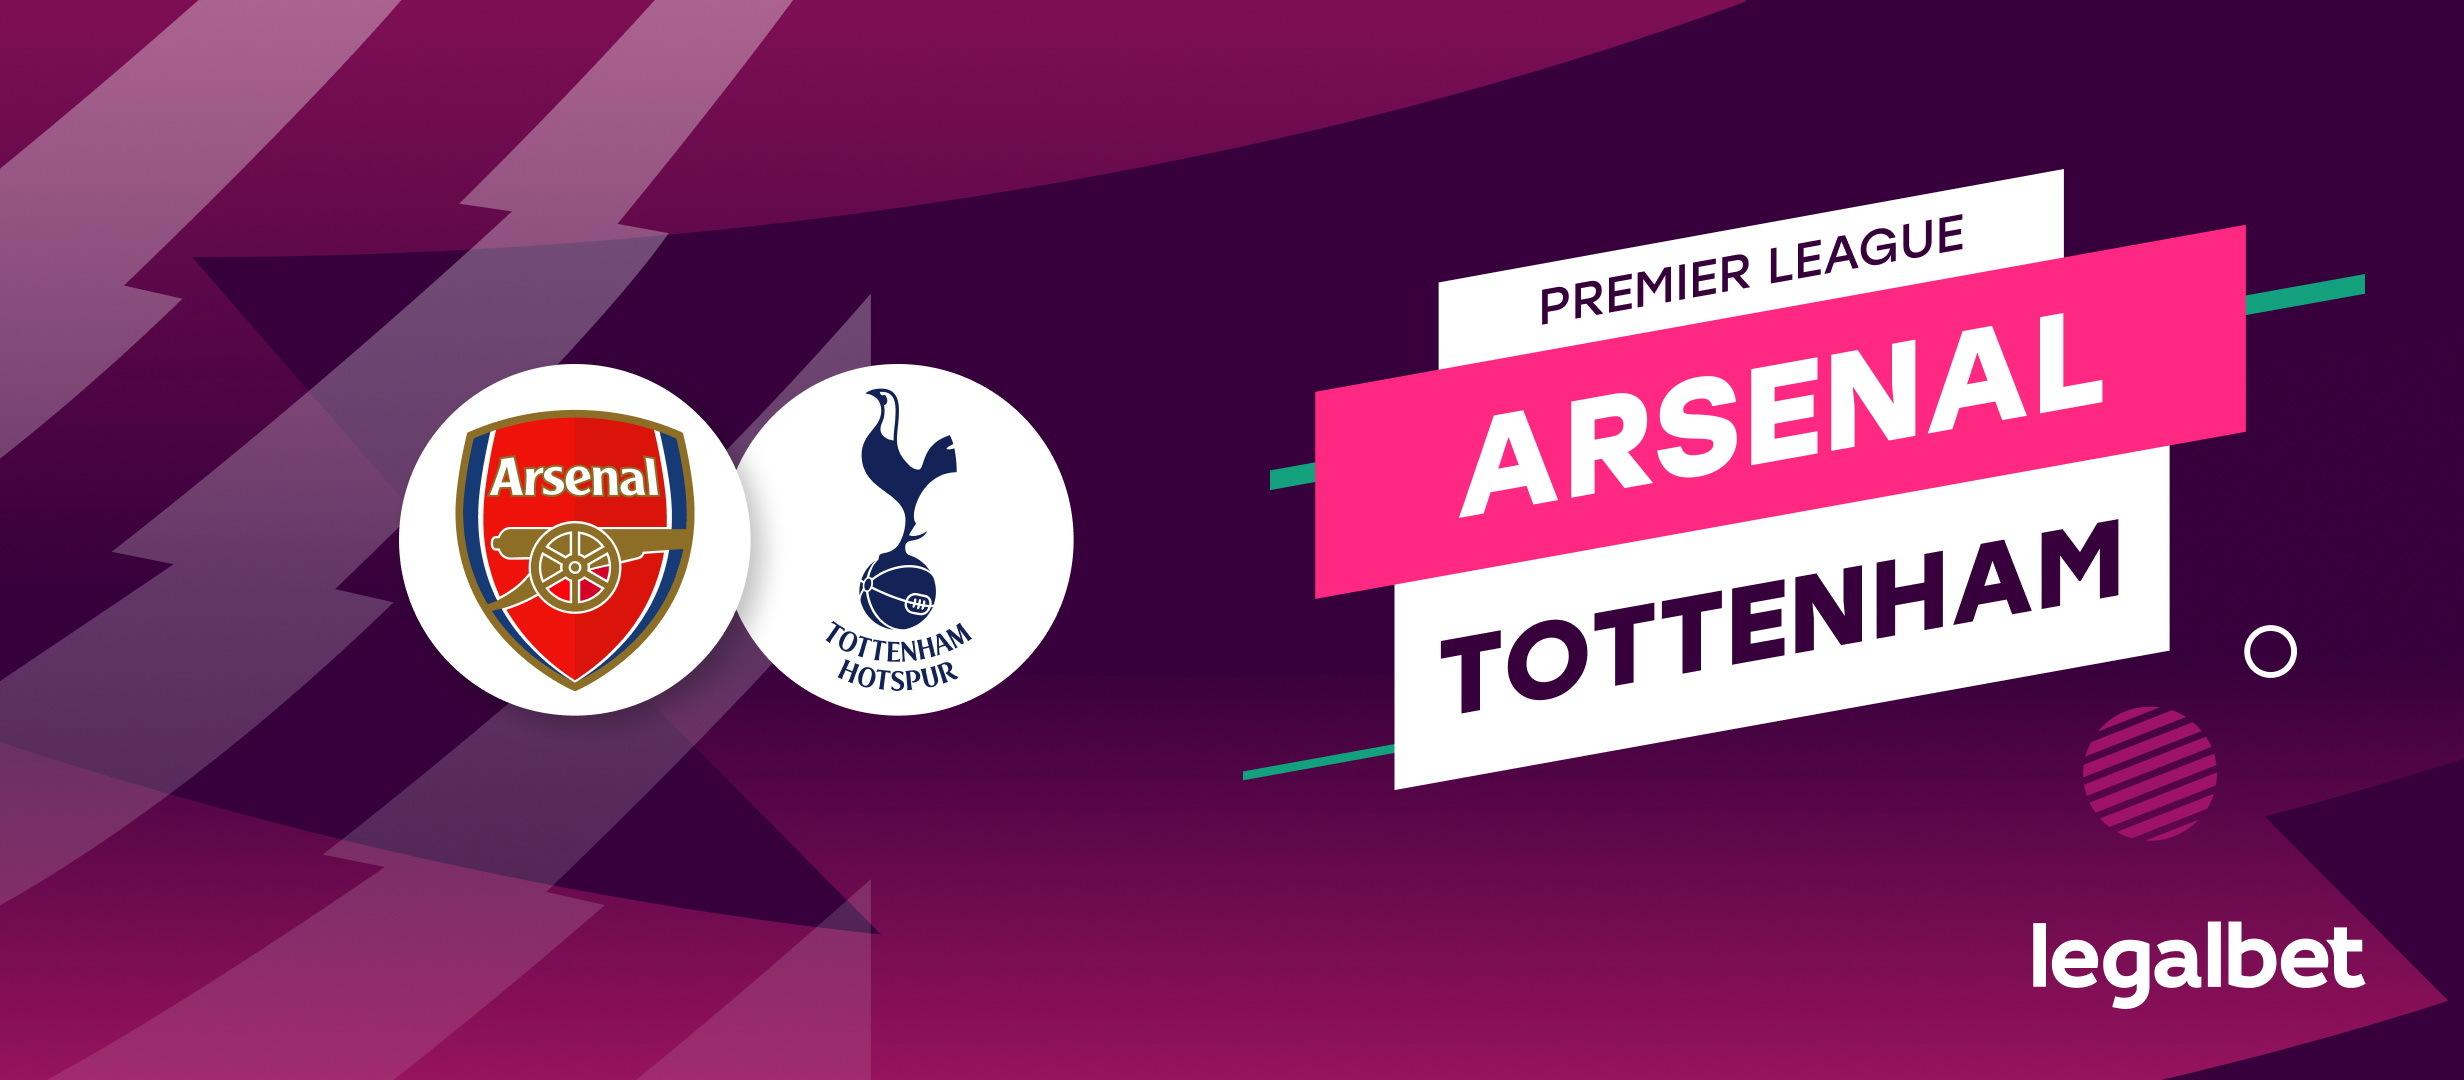 Arsenal-Tottenham: super pont pentru un super derby